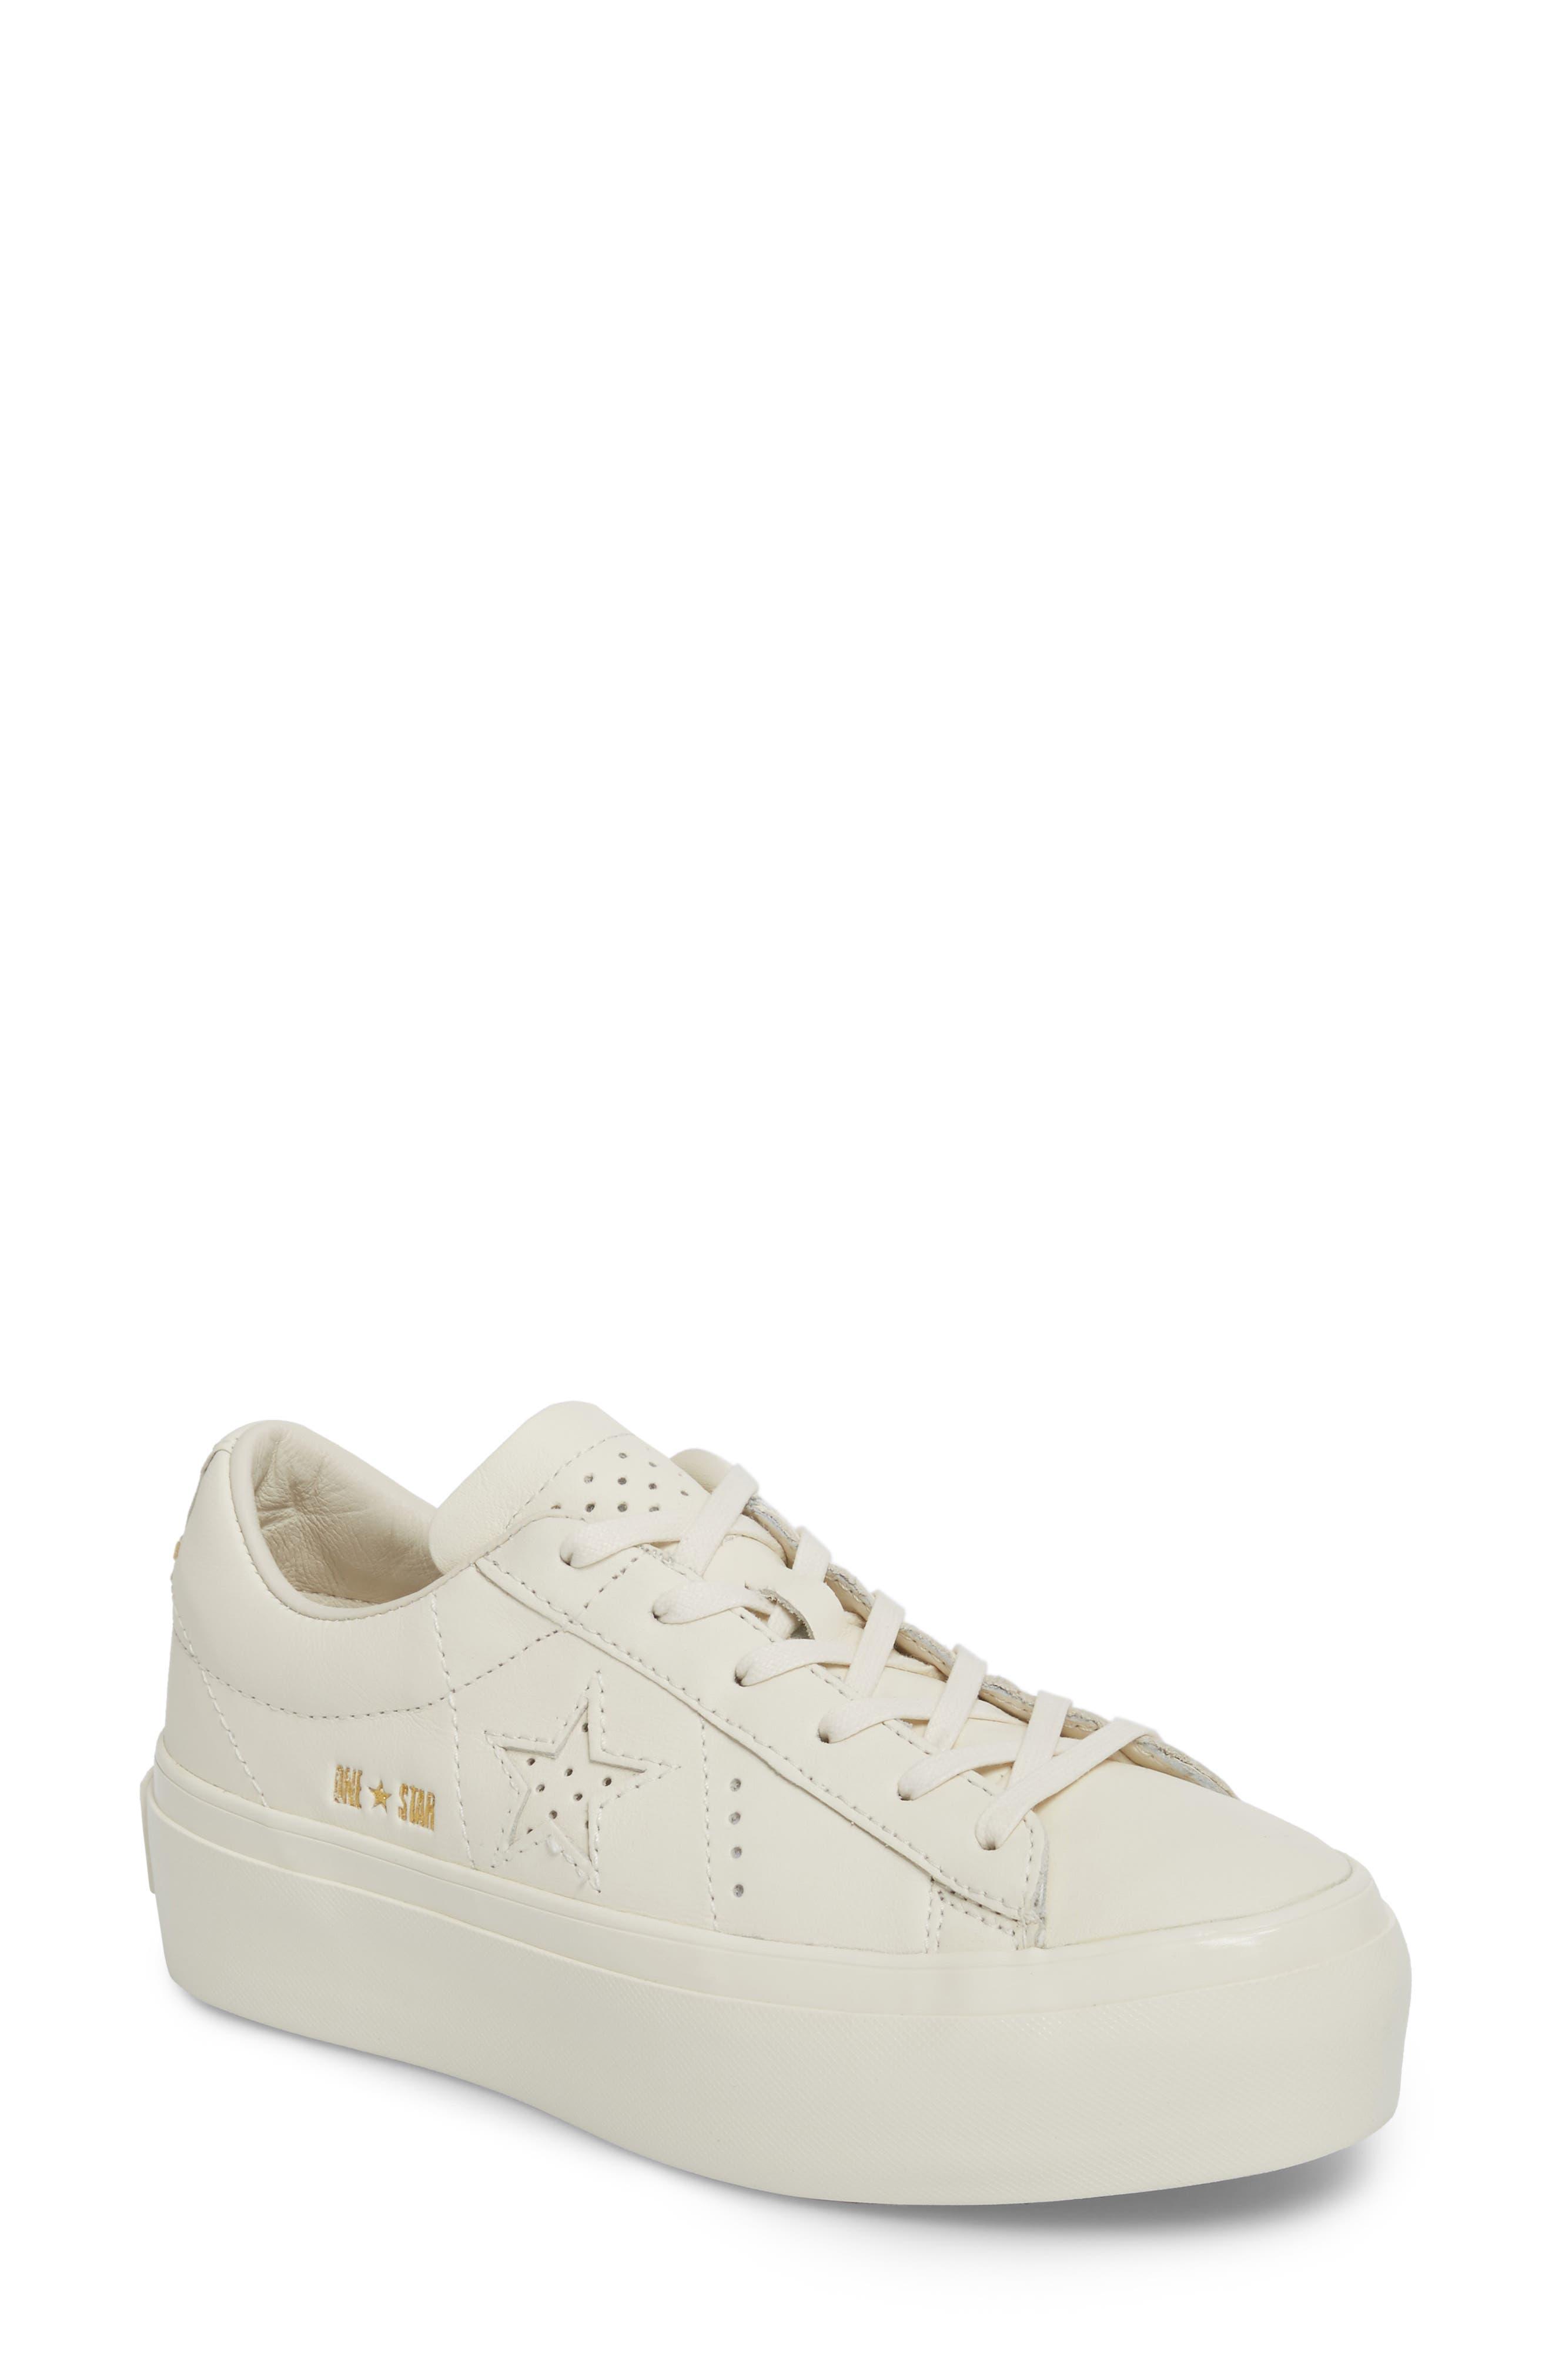 Chuck Taylor<sup>®</sup> All Star<sup>®</sup> One Star Platform Sneaker,                         Main,                         color, Egret/ Egret